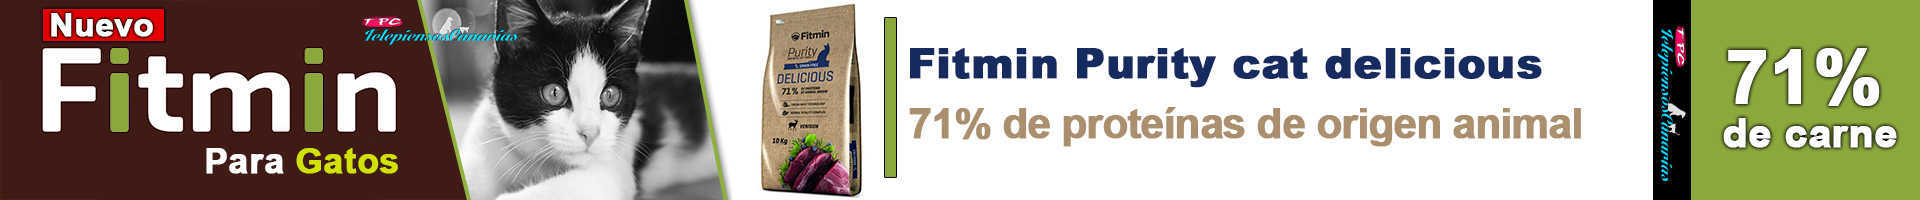 Fitmin Purity delicious gatos, con carne de venado fresca 25%,